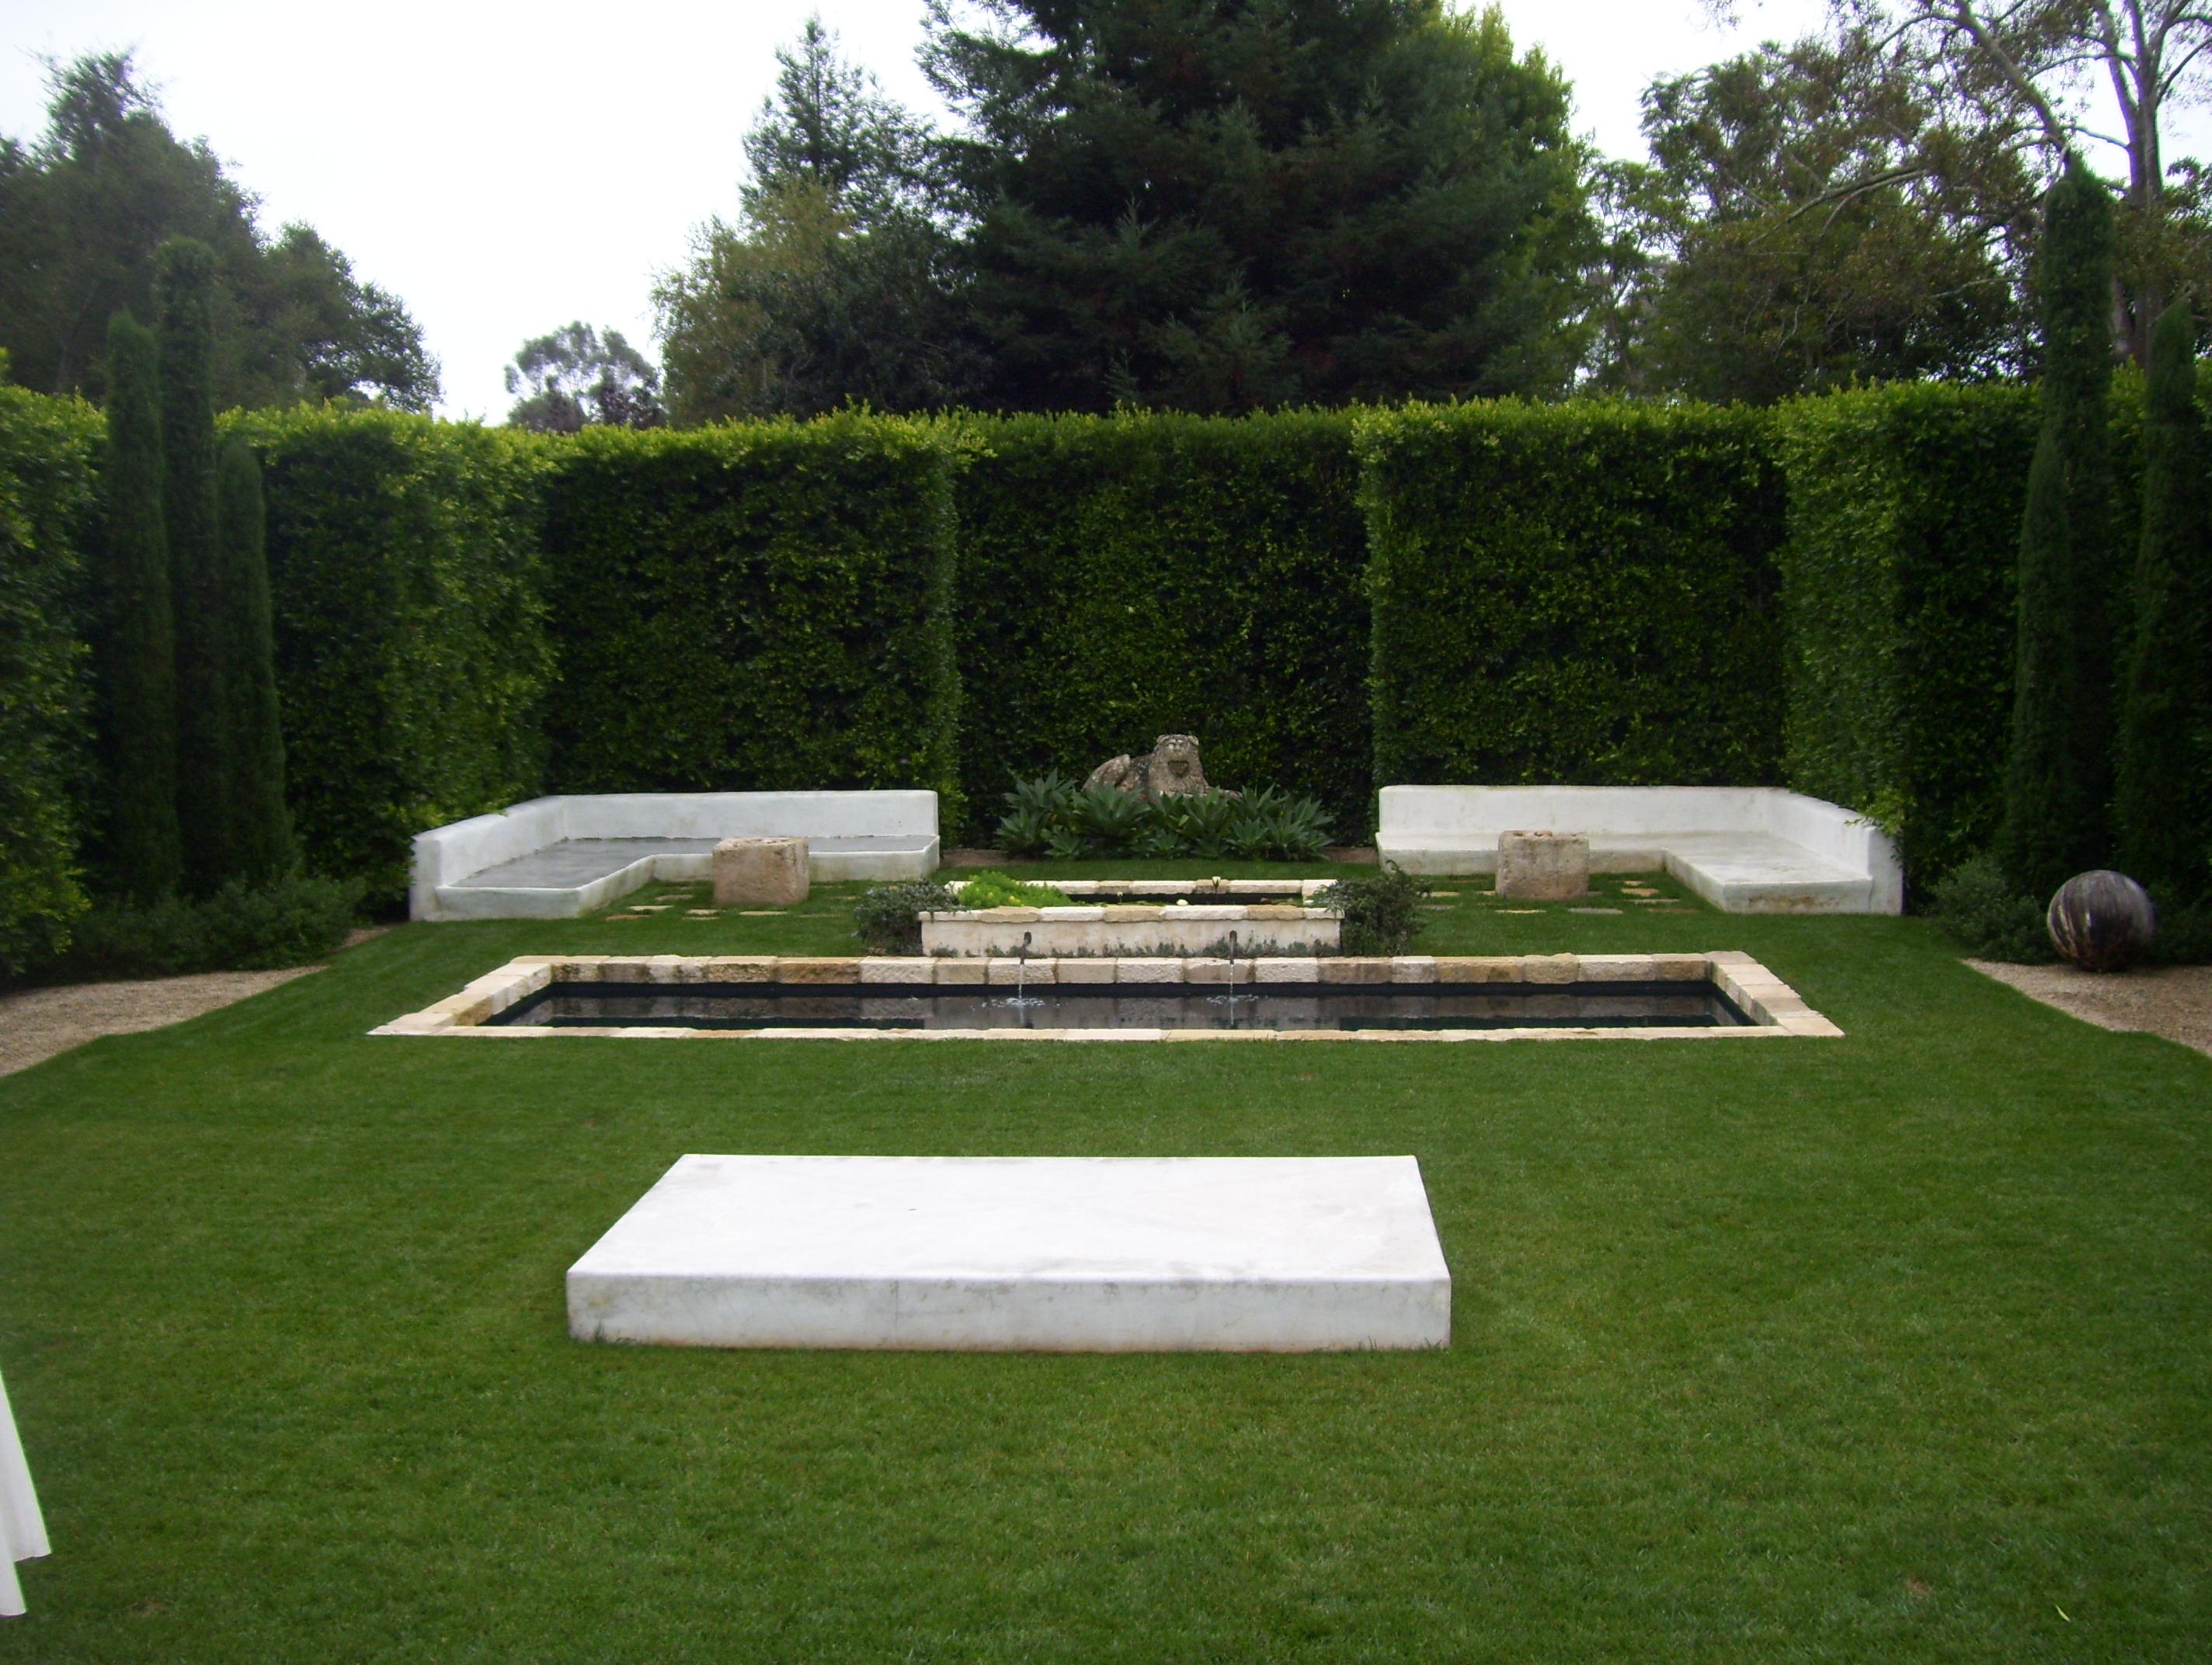 Secret Garden Design And Installation In Santa Barbara